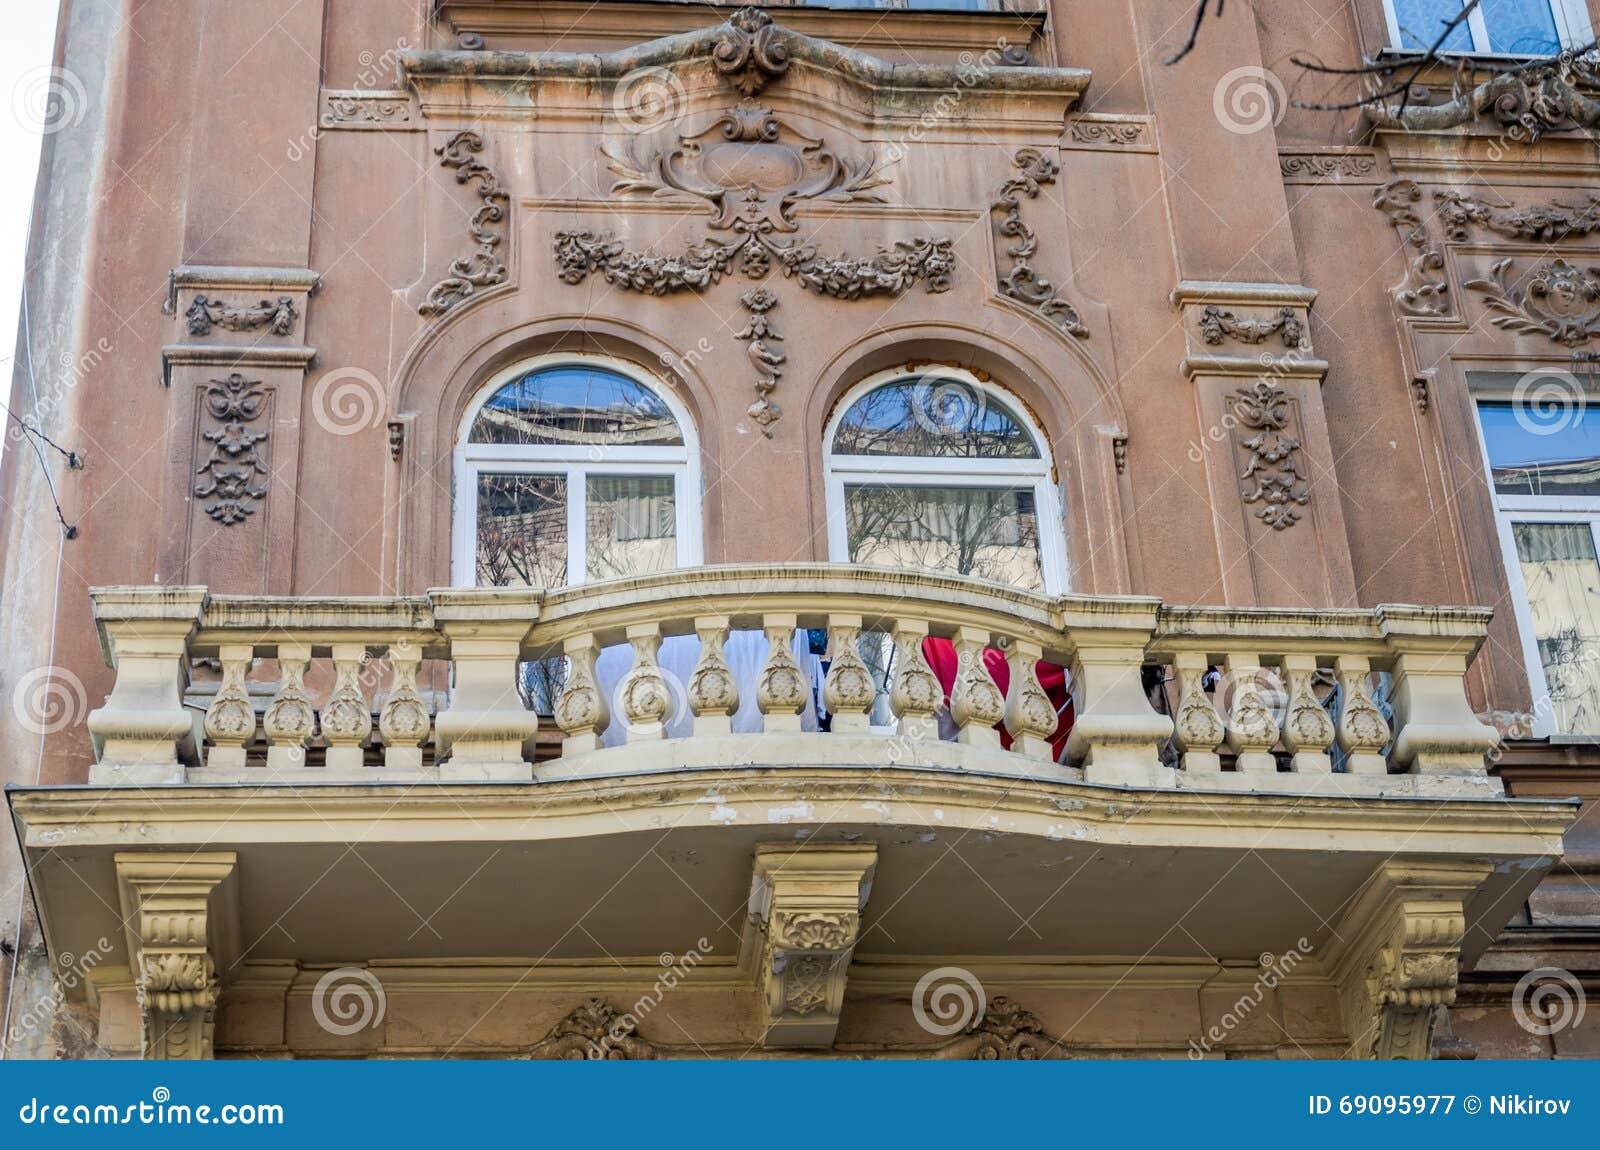 Balcony Ornaments 100 Images Apartment Balcony